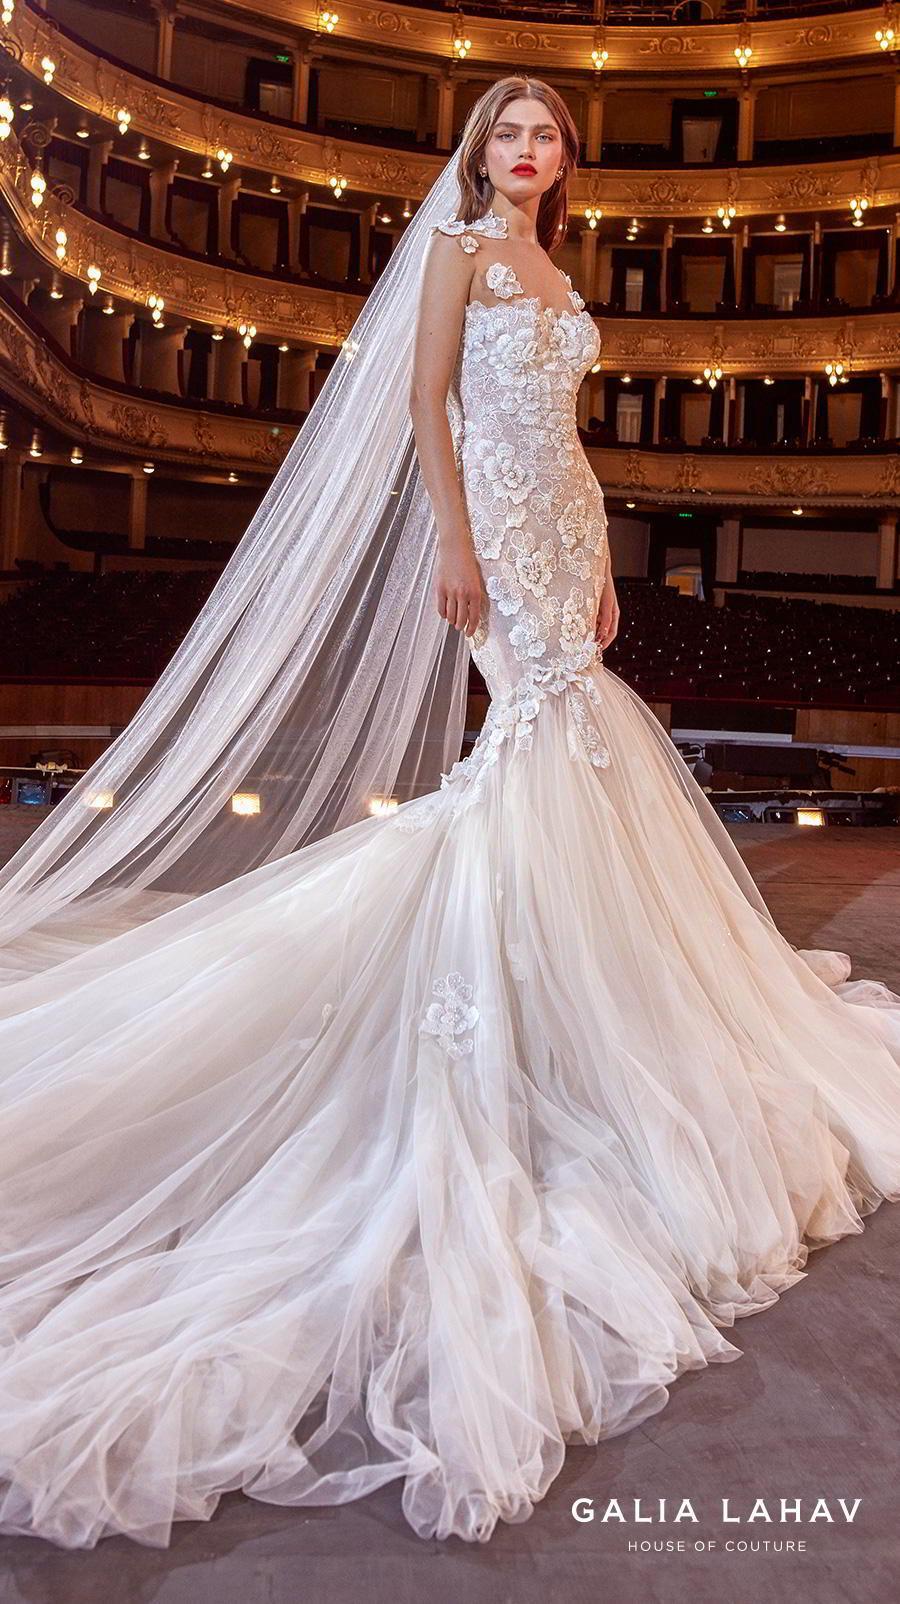 909251f79bf46 WEDDING IDEAS & INSPIRATIONS – Steal the Show with Galia Lahav ...